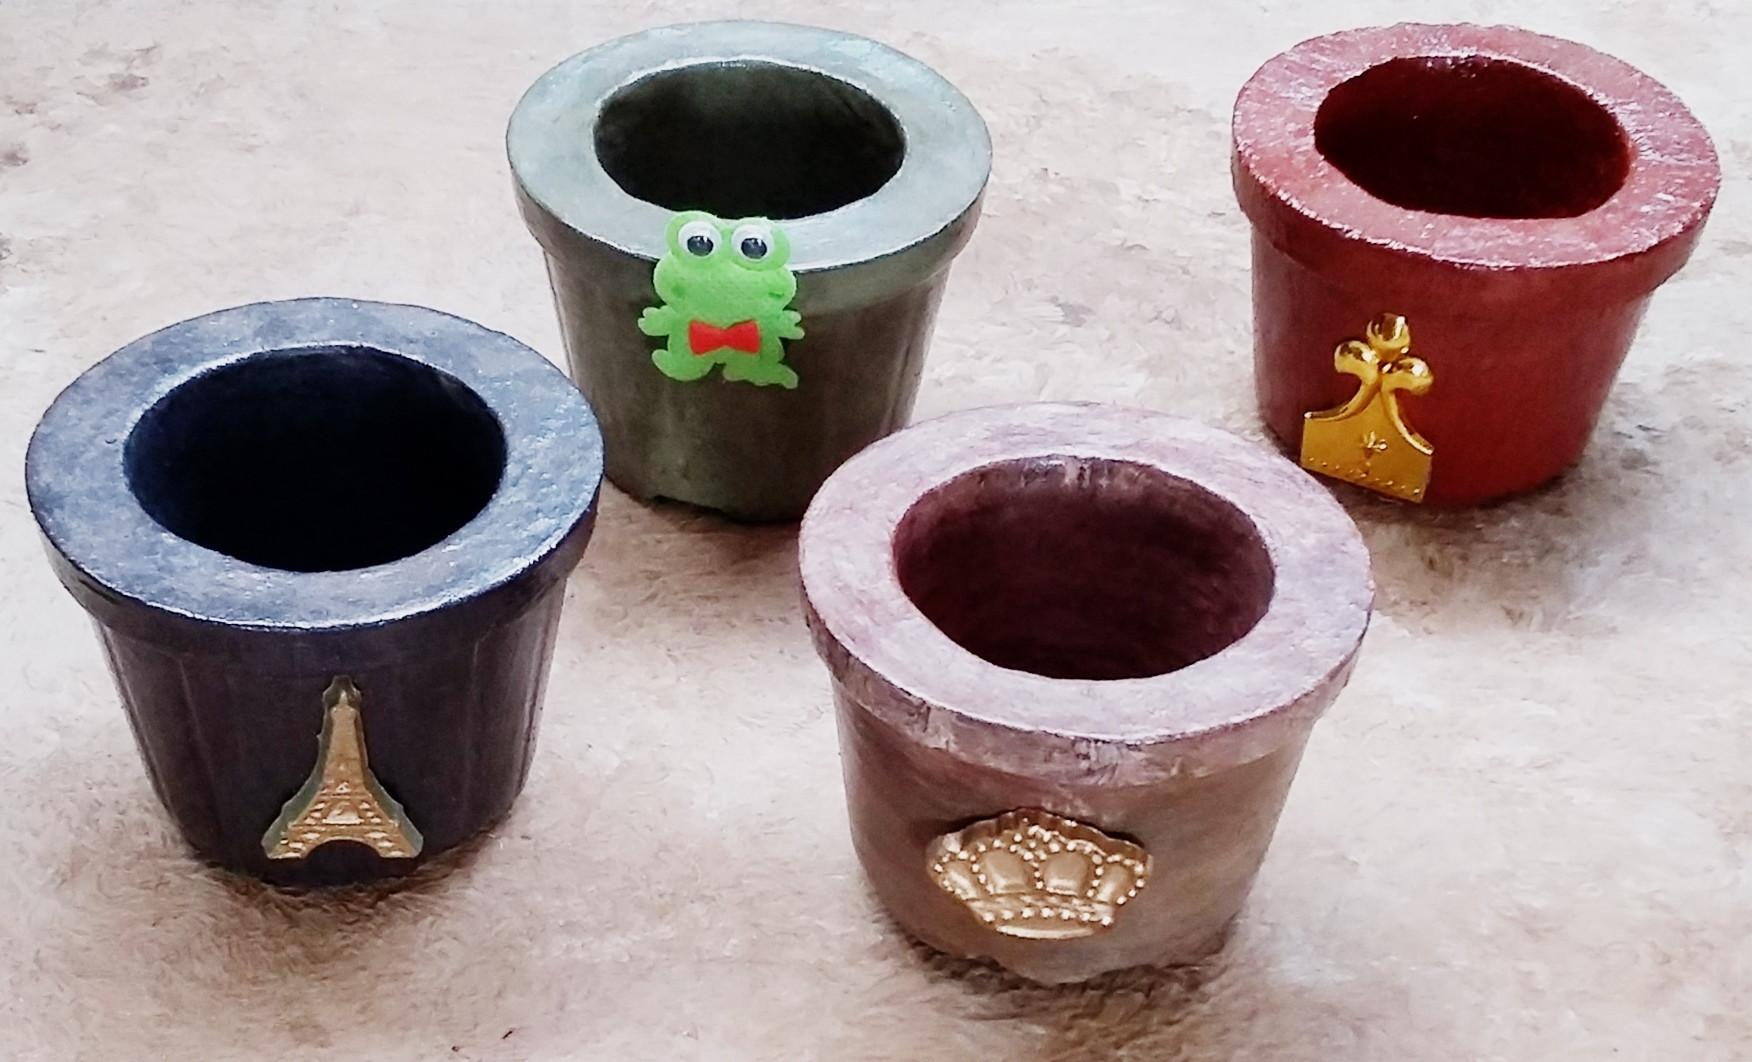 Vaso De Cimento Colorido Com Desenho No Elo7 Harumi Zzara Art